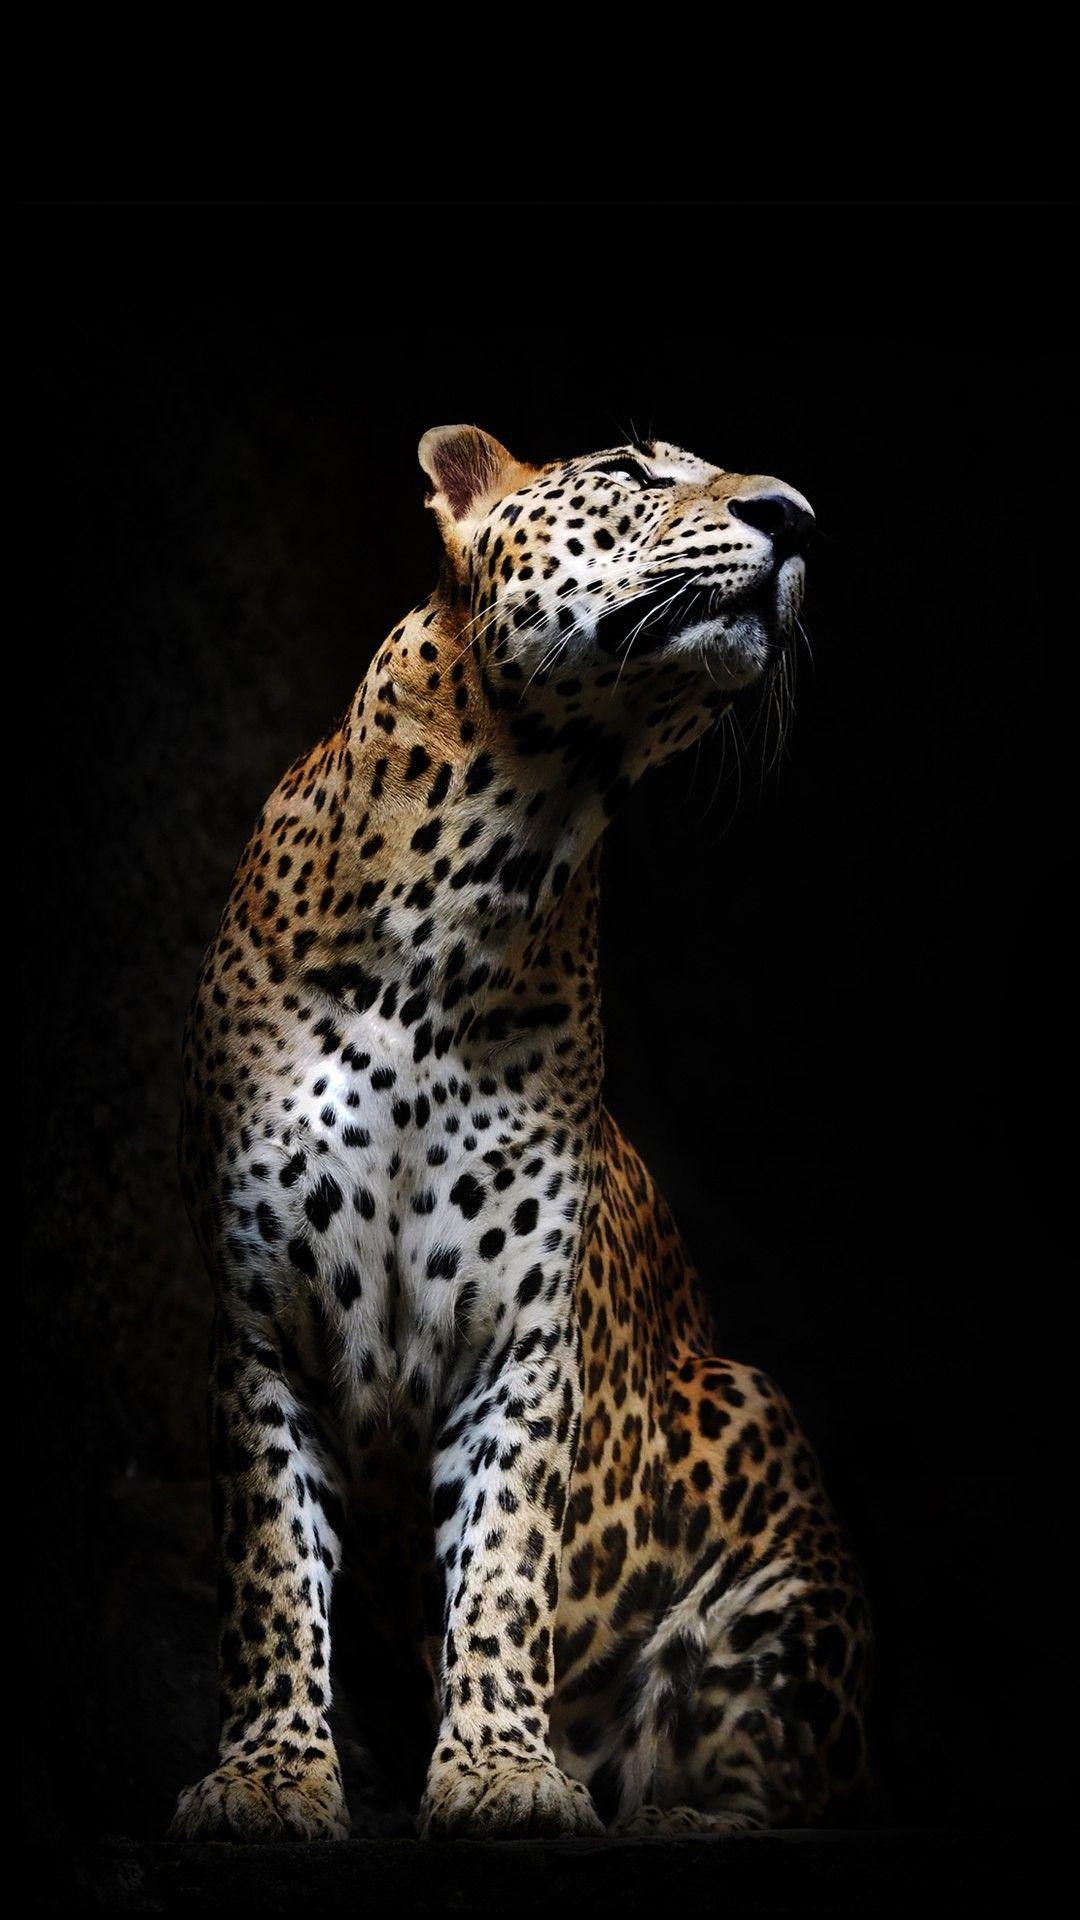 Pin de H. Liebe en Tiere | Pinterest | Animales, Anatomia ...